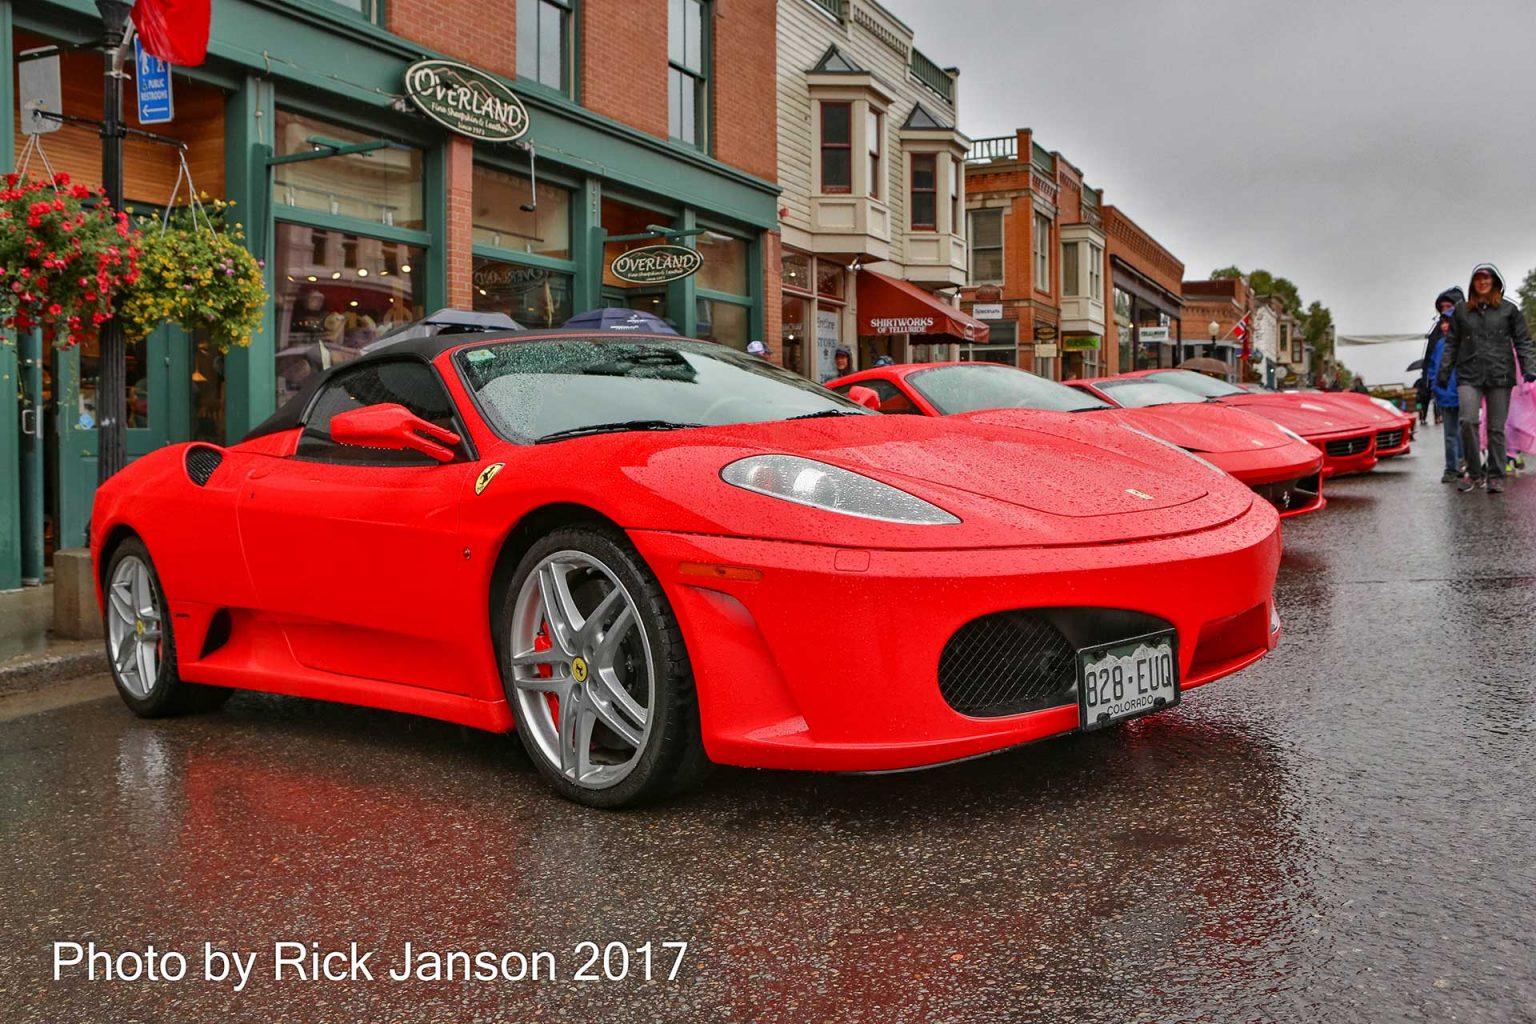 22-30-_Rick-Janson-2017--(65-of-166)_2439_2501